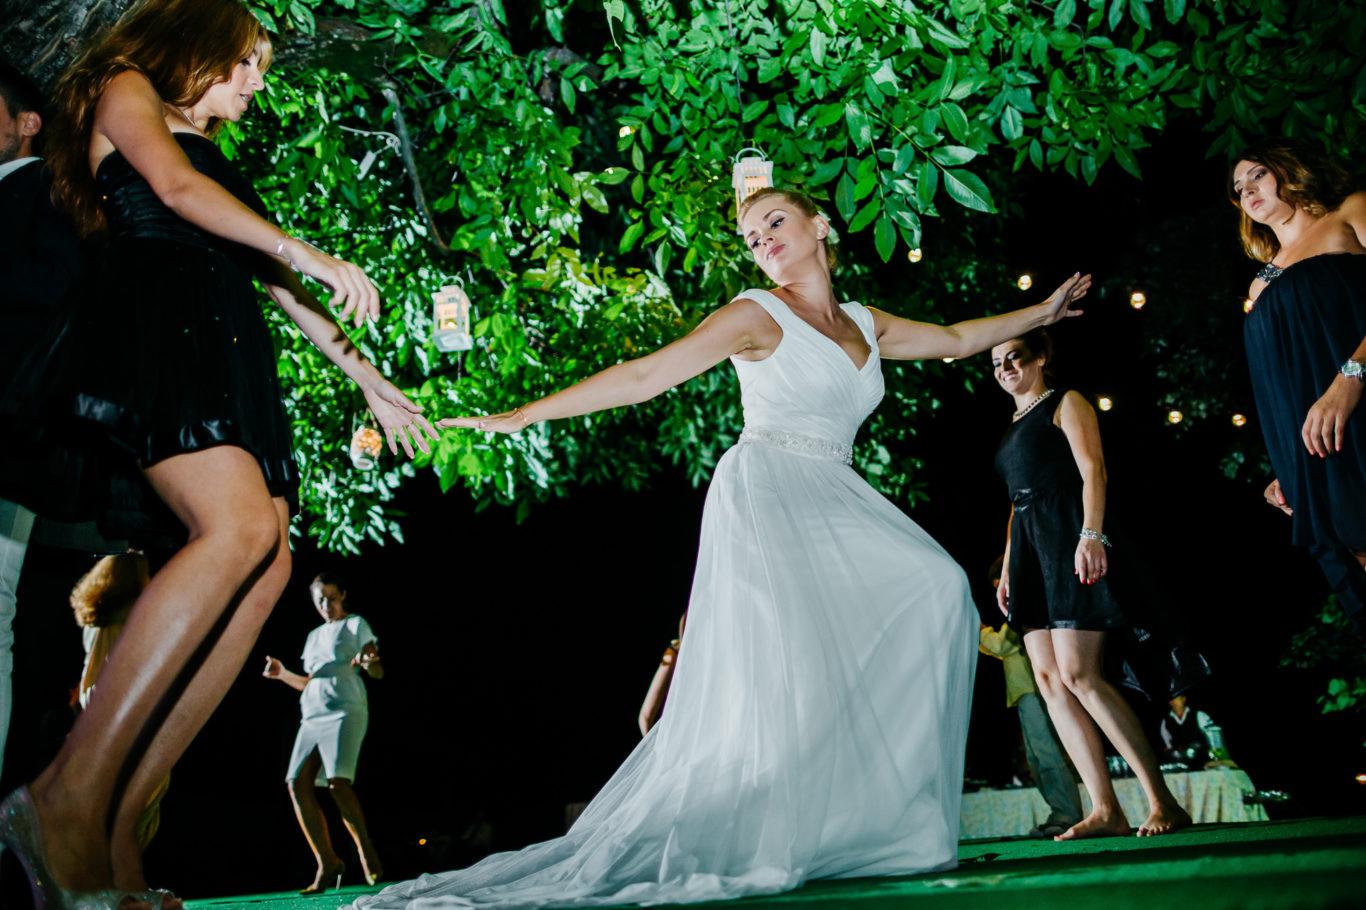 0597-fotoreportaj-nunta-conacul-maldar-cristina-stefan-fotograf-ciprian-dumitrescu-dc1_2905